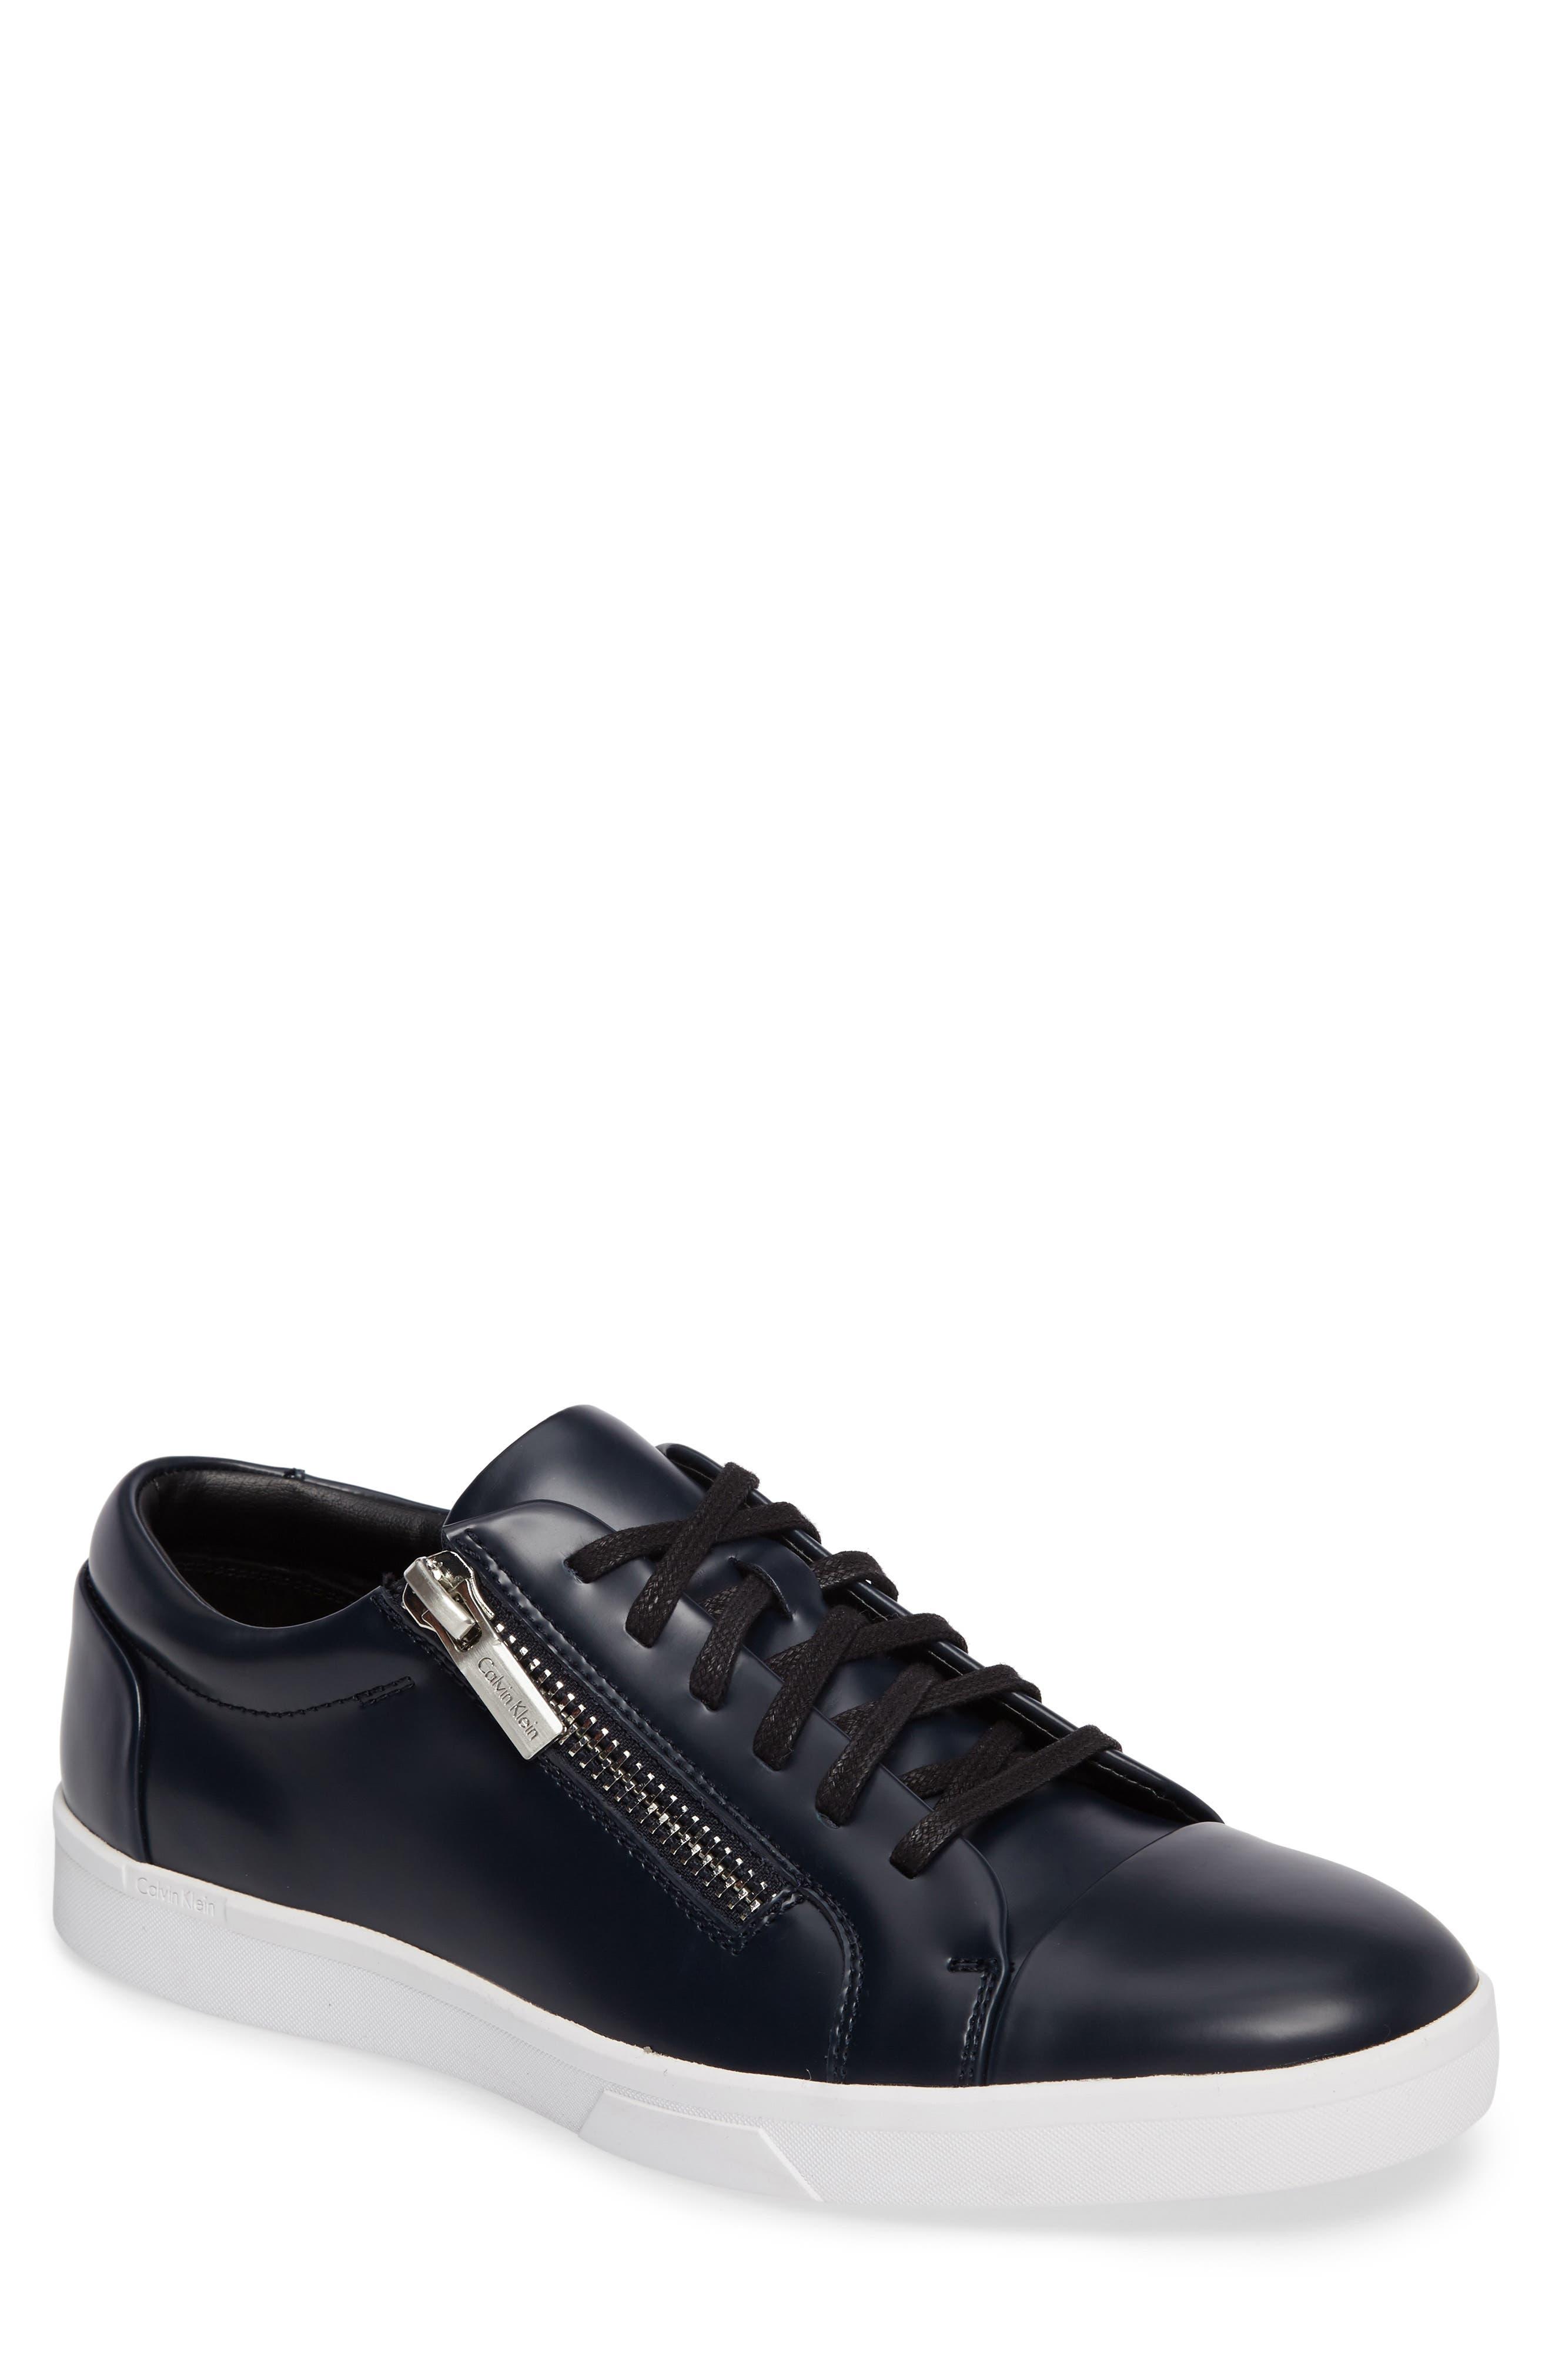 Ibrahim Cap-Toe Zip Sneaker,                             Main thumbnail 3, color,